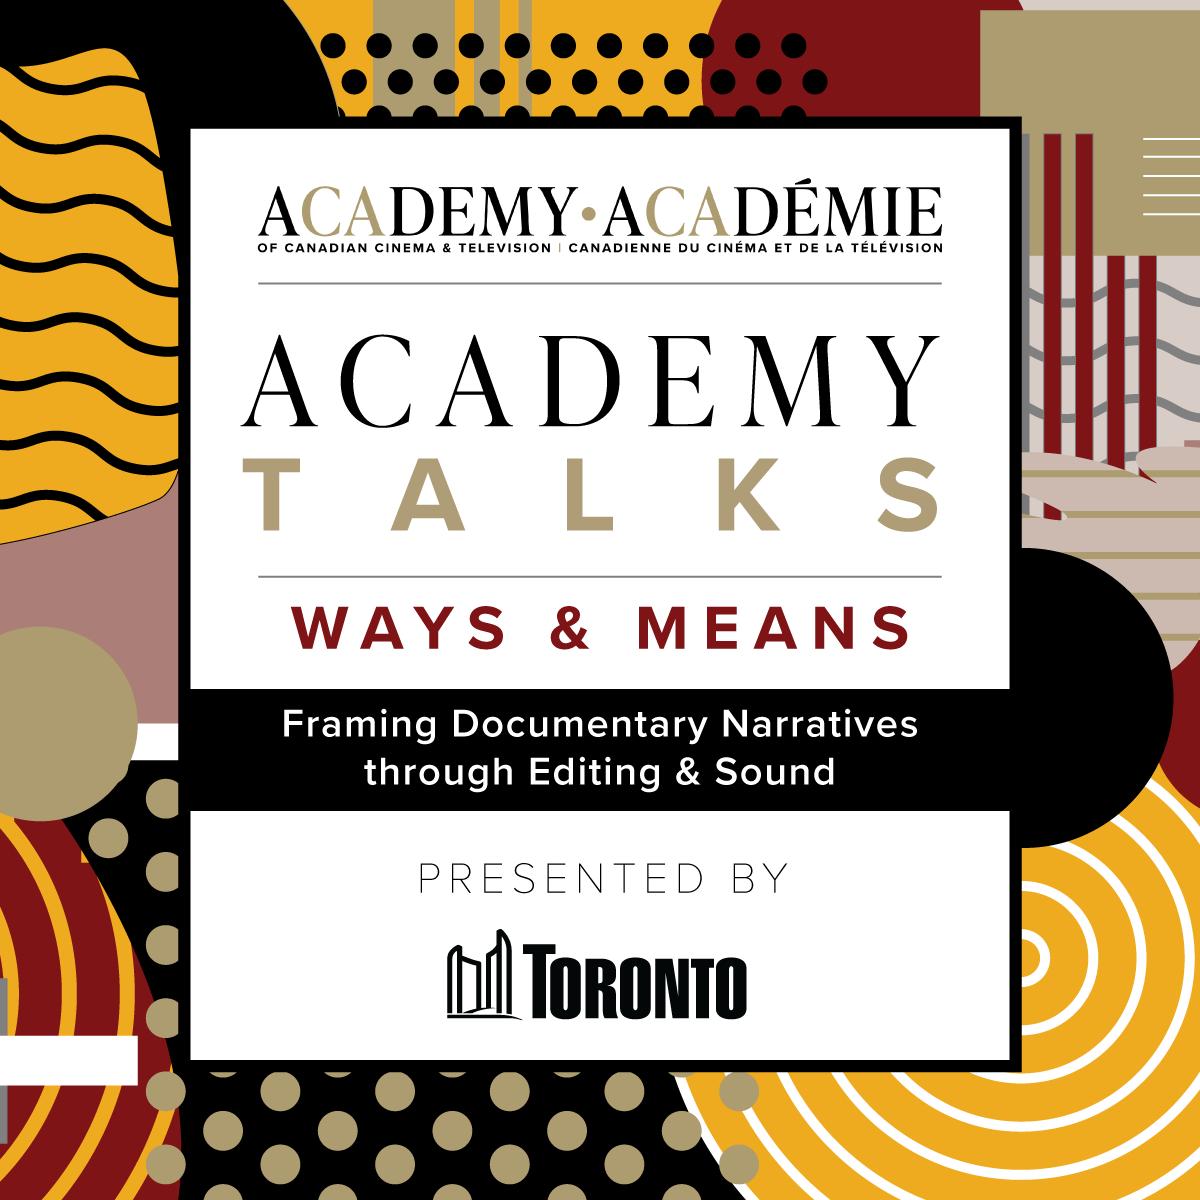 Academy Talks: Ways & Means | Framing Documentary Narratives through Editing & Sound